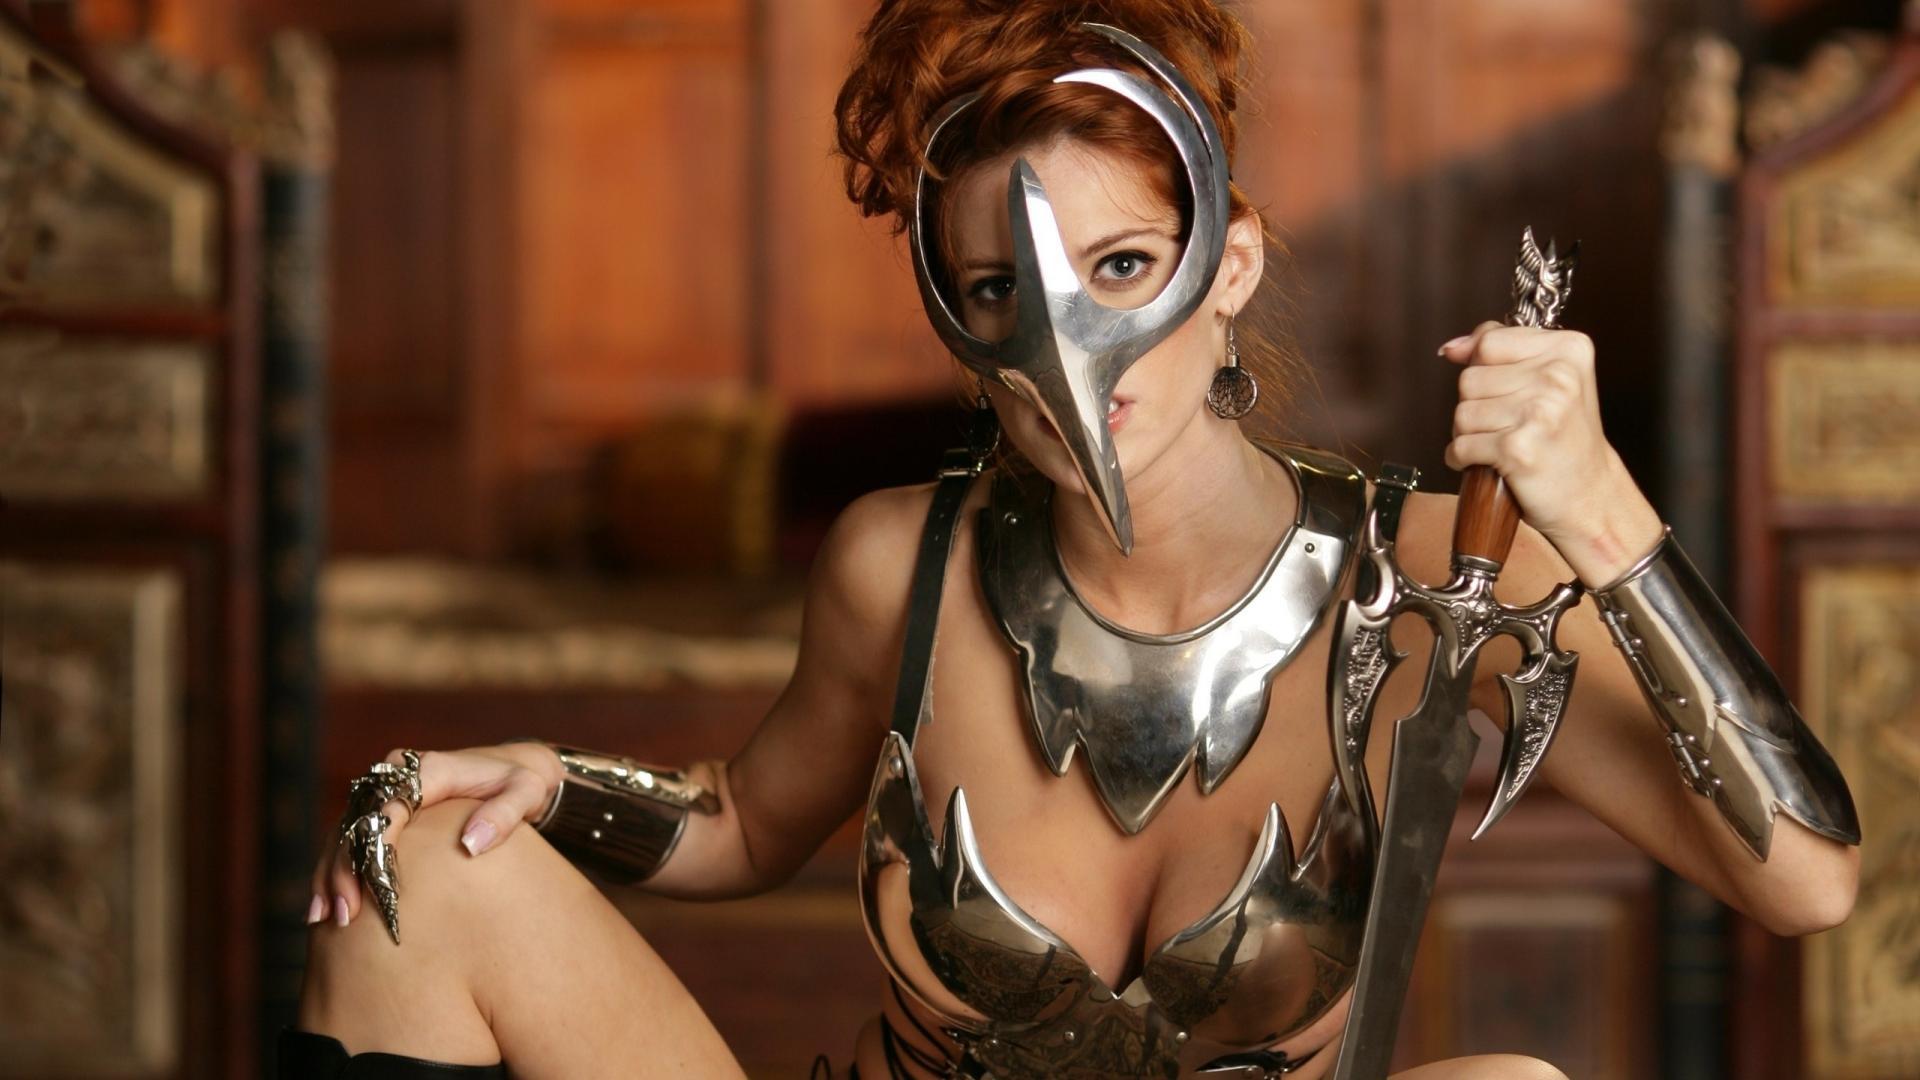 http://1.bp.blogspot.com/-H0nZRya4TiA/UBziY_zCAOI/AAAAAAAACTk/pPW_8GAYeV0/s1920/sword-mask-world-of-whorecraft-woman-girl-movies-1080x1920.jpg